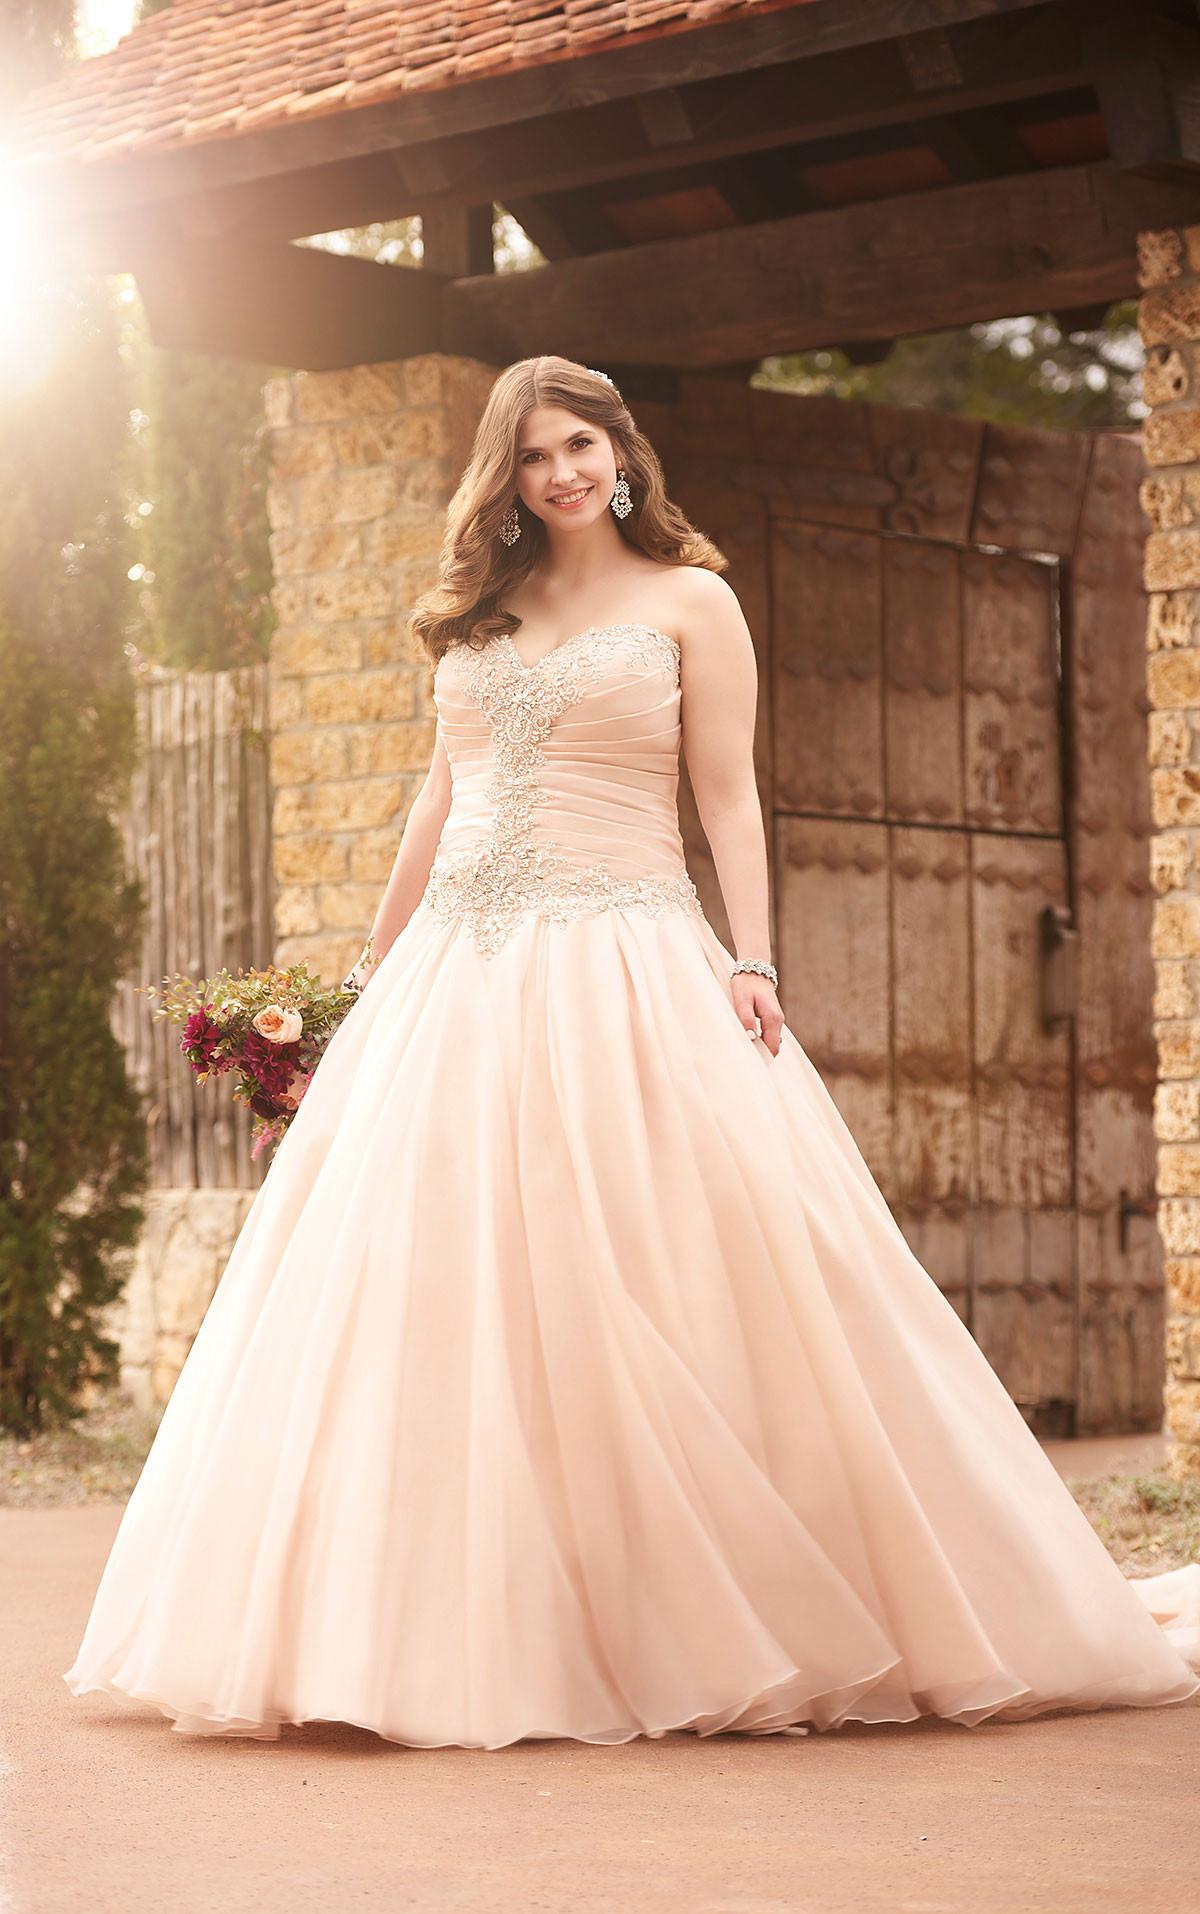 Pink Gowns Dress For Weddings  Best Plus Size Wedding Dresses — Shop Beautiful Wedding